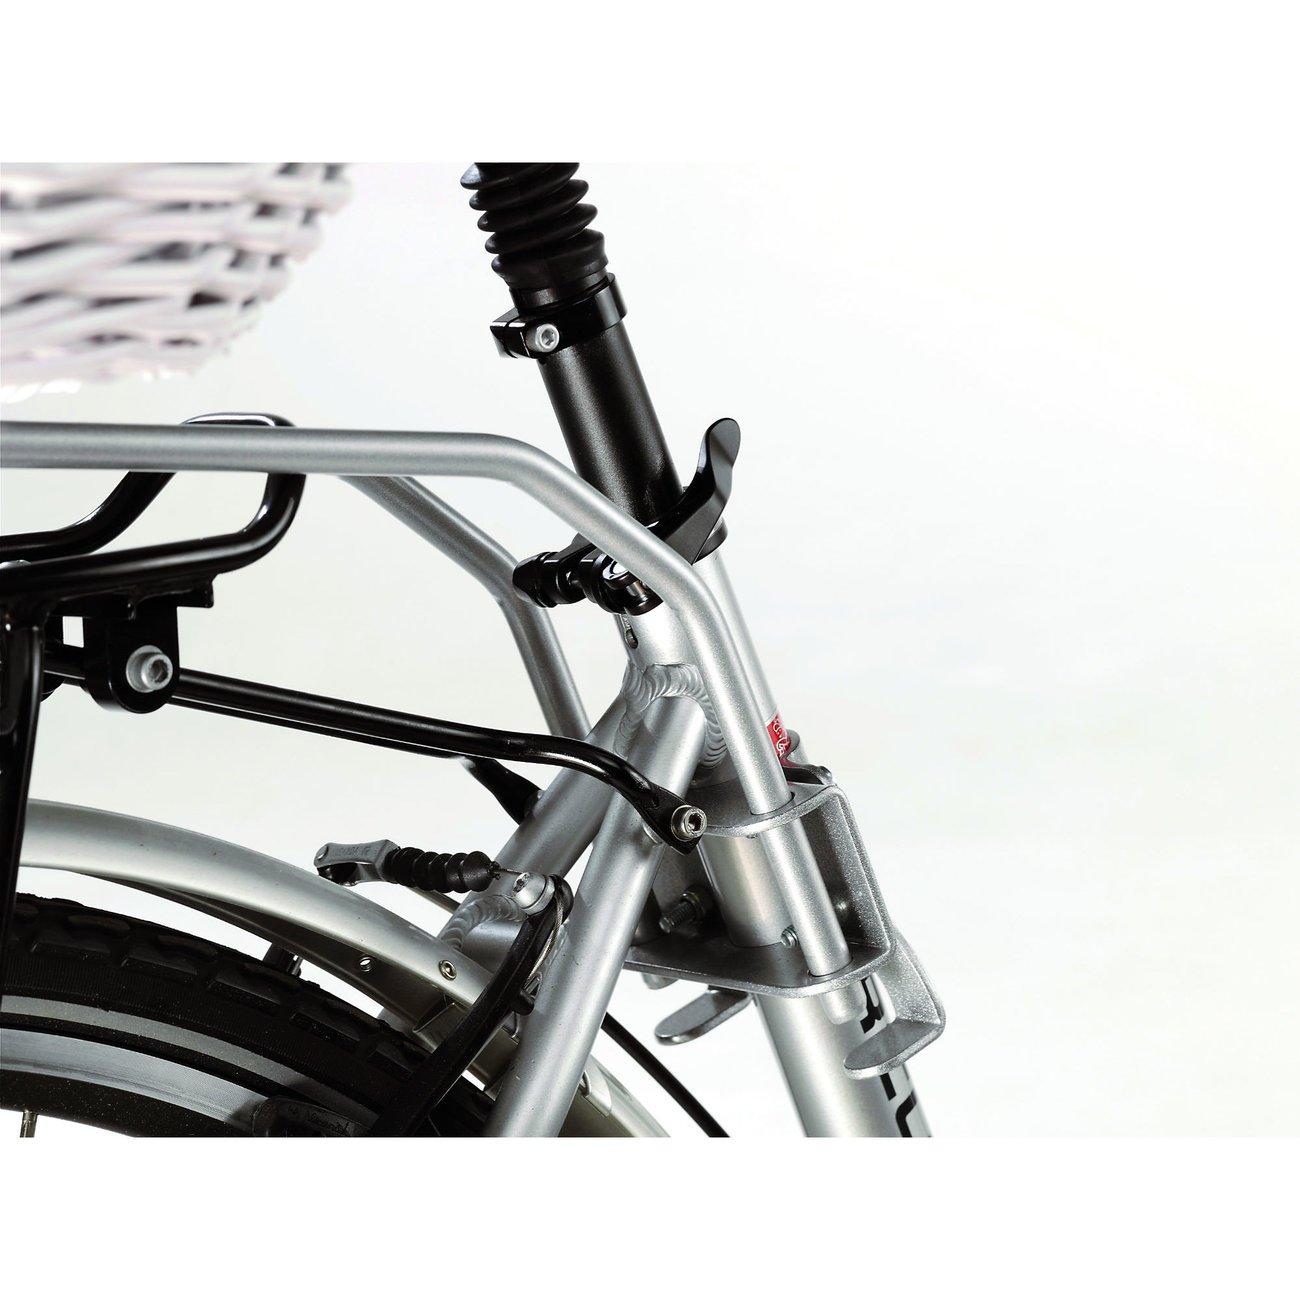 Aumüller Fahrradkorb für Hunde Rahmenmontage hinten, Bild 9